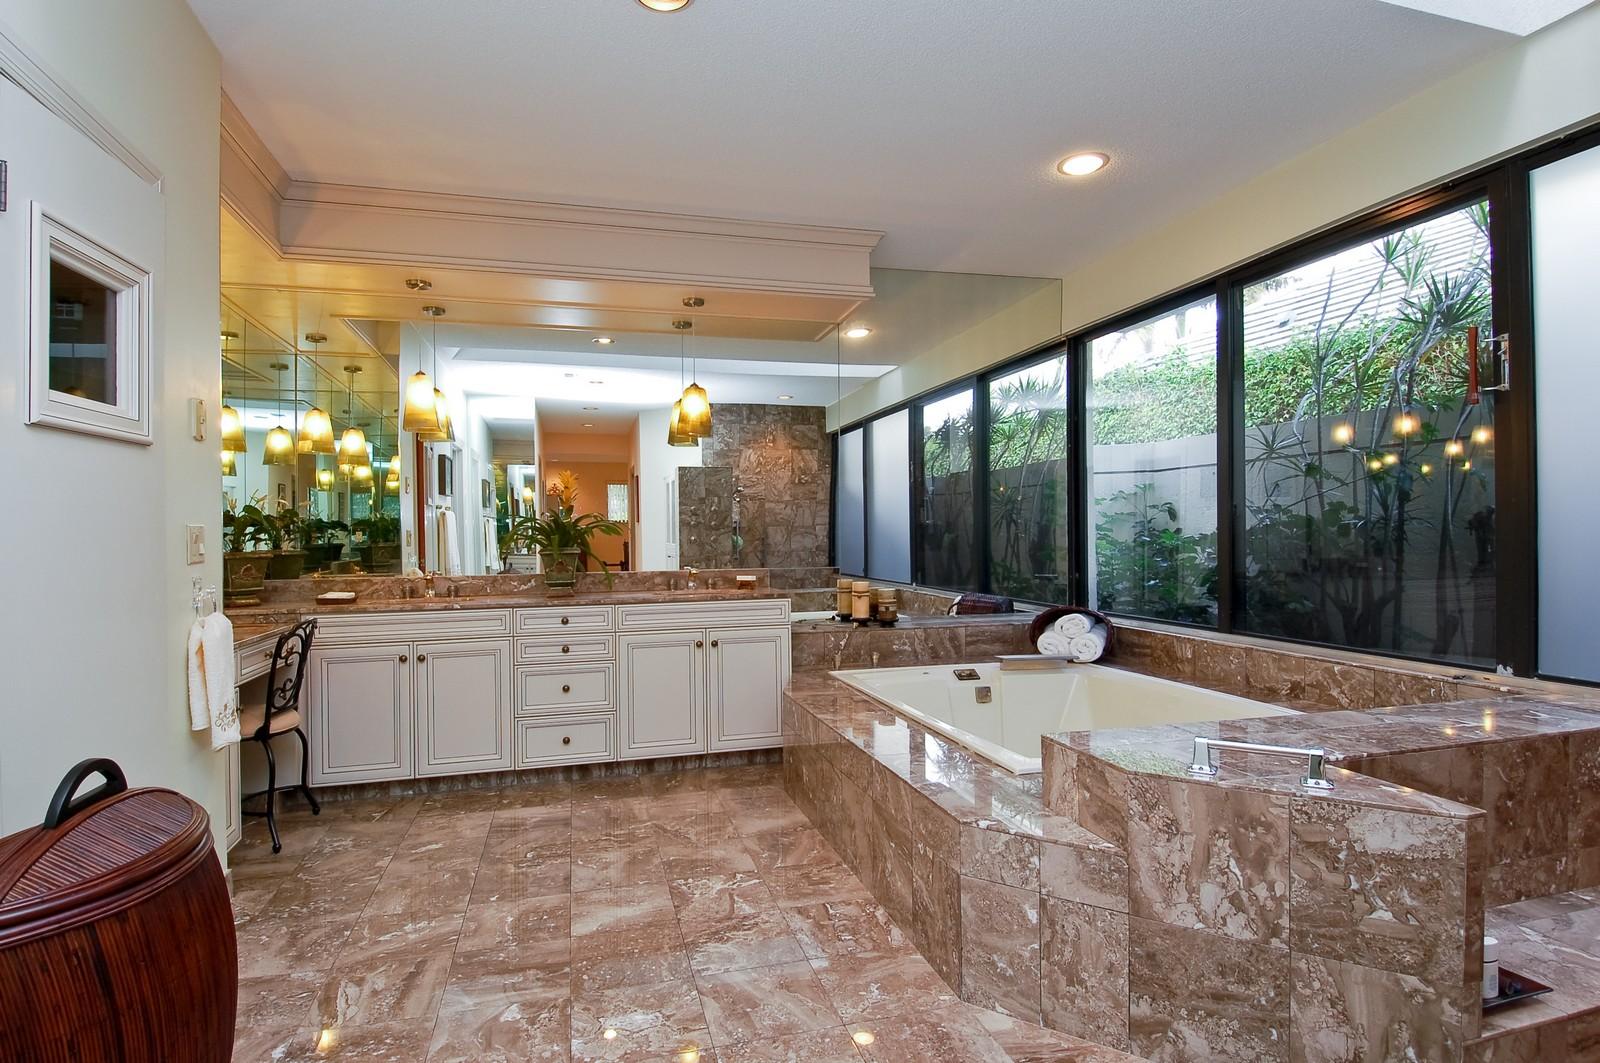 Real Estate Photography - 7339 Mandarin, Boca Raton, FL, 33433 - Master Bathroom